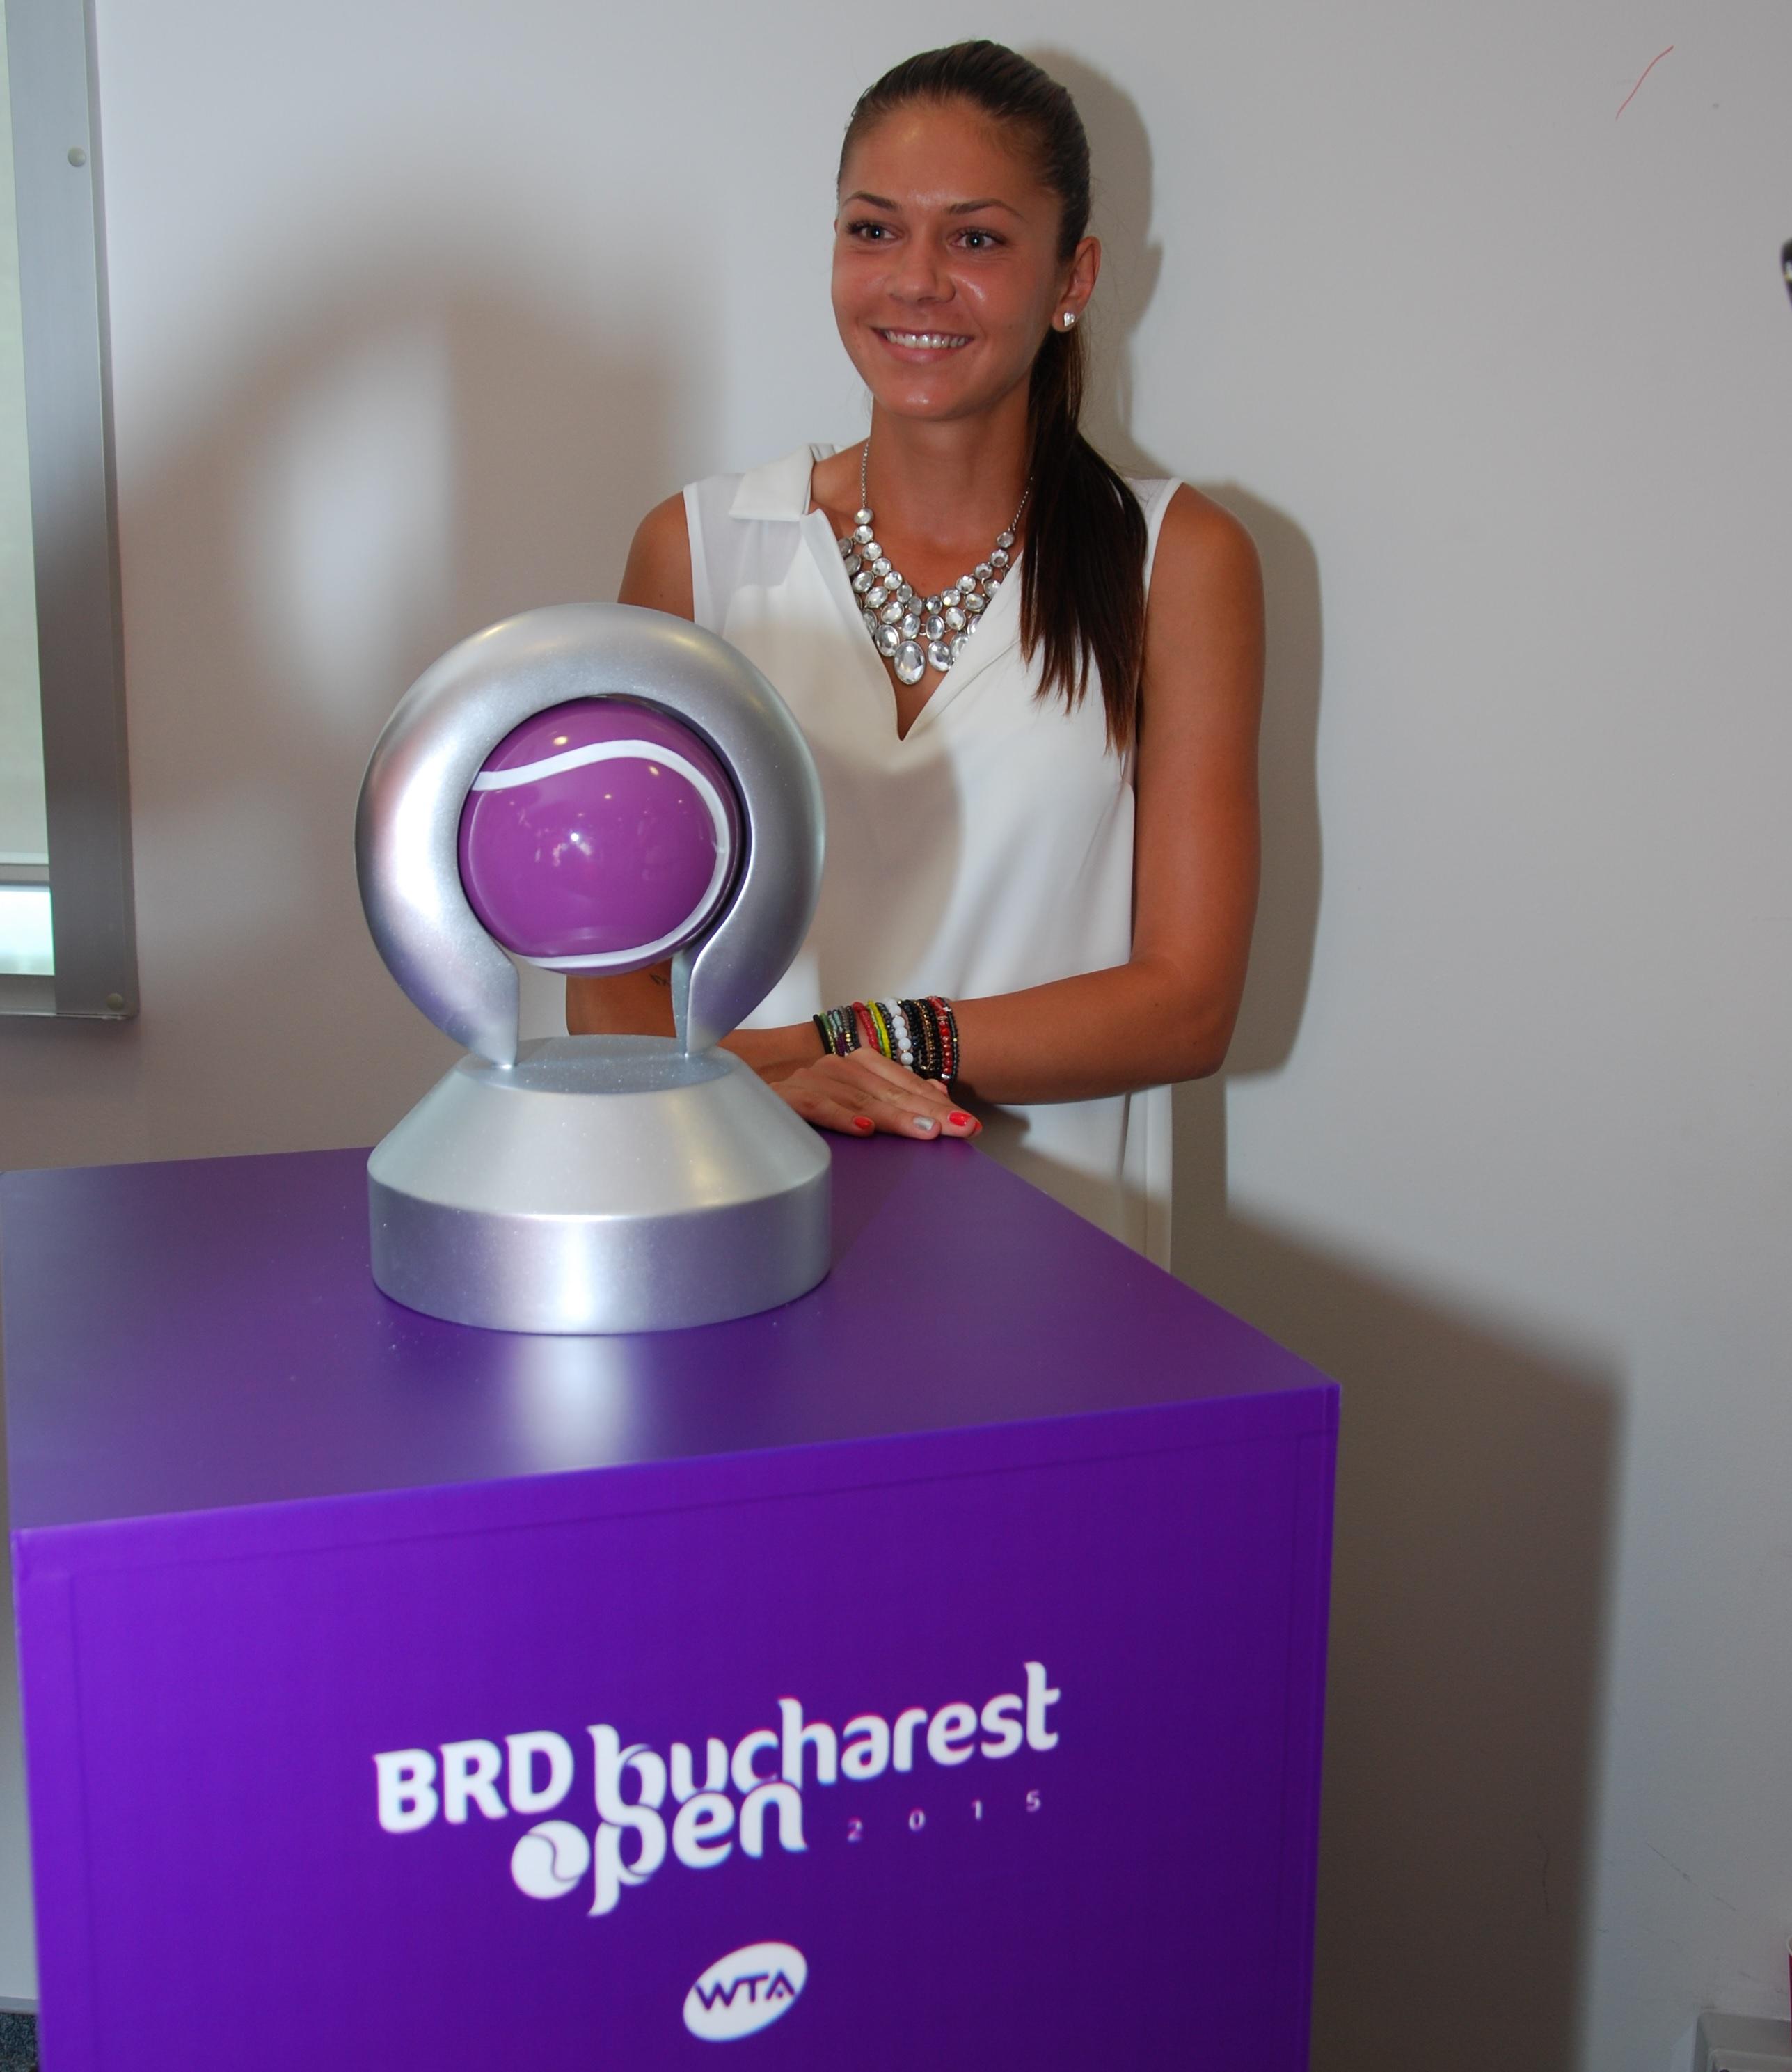 Andreea Mitu - trofeul BRD Bucharest Open 2015